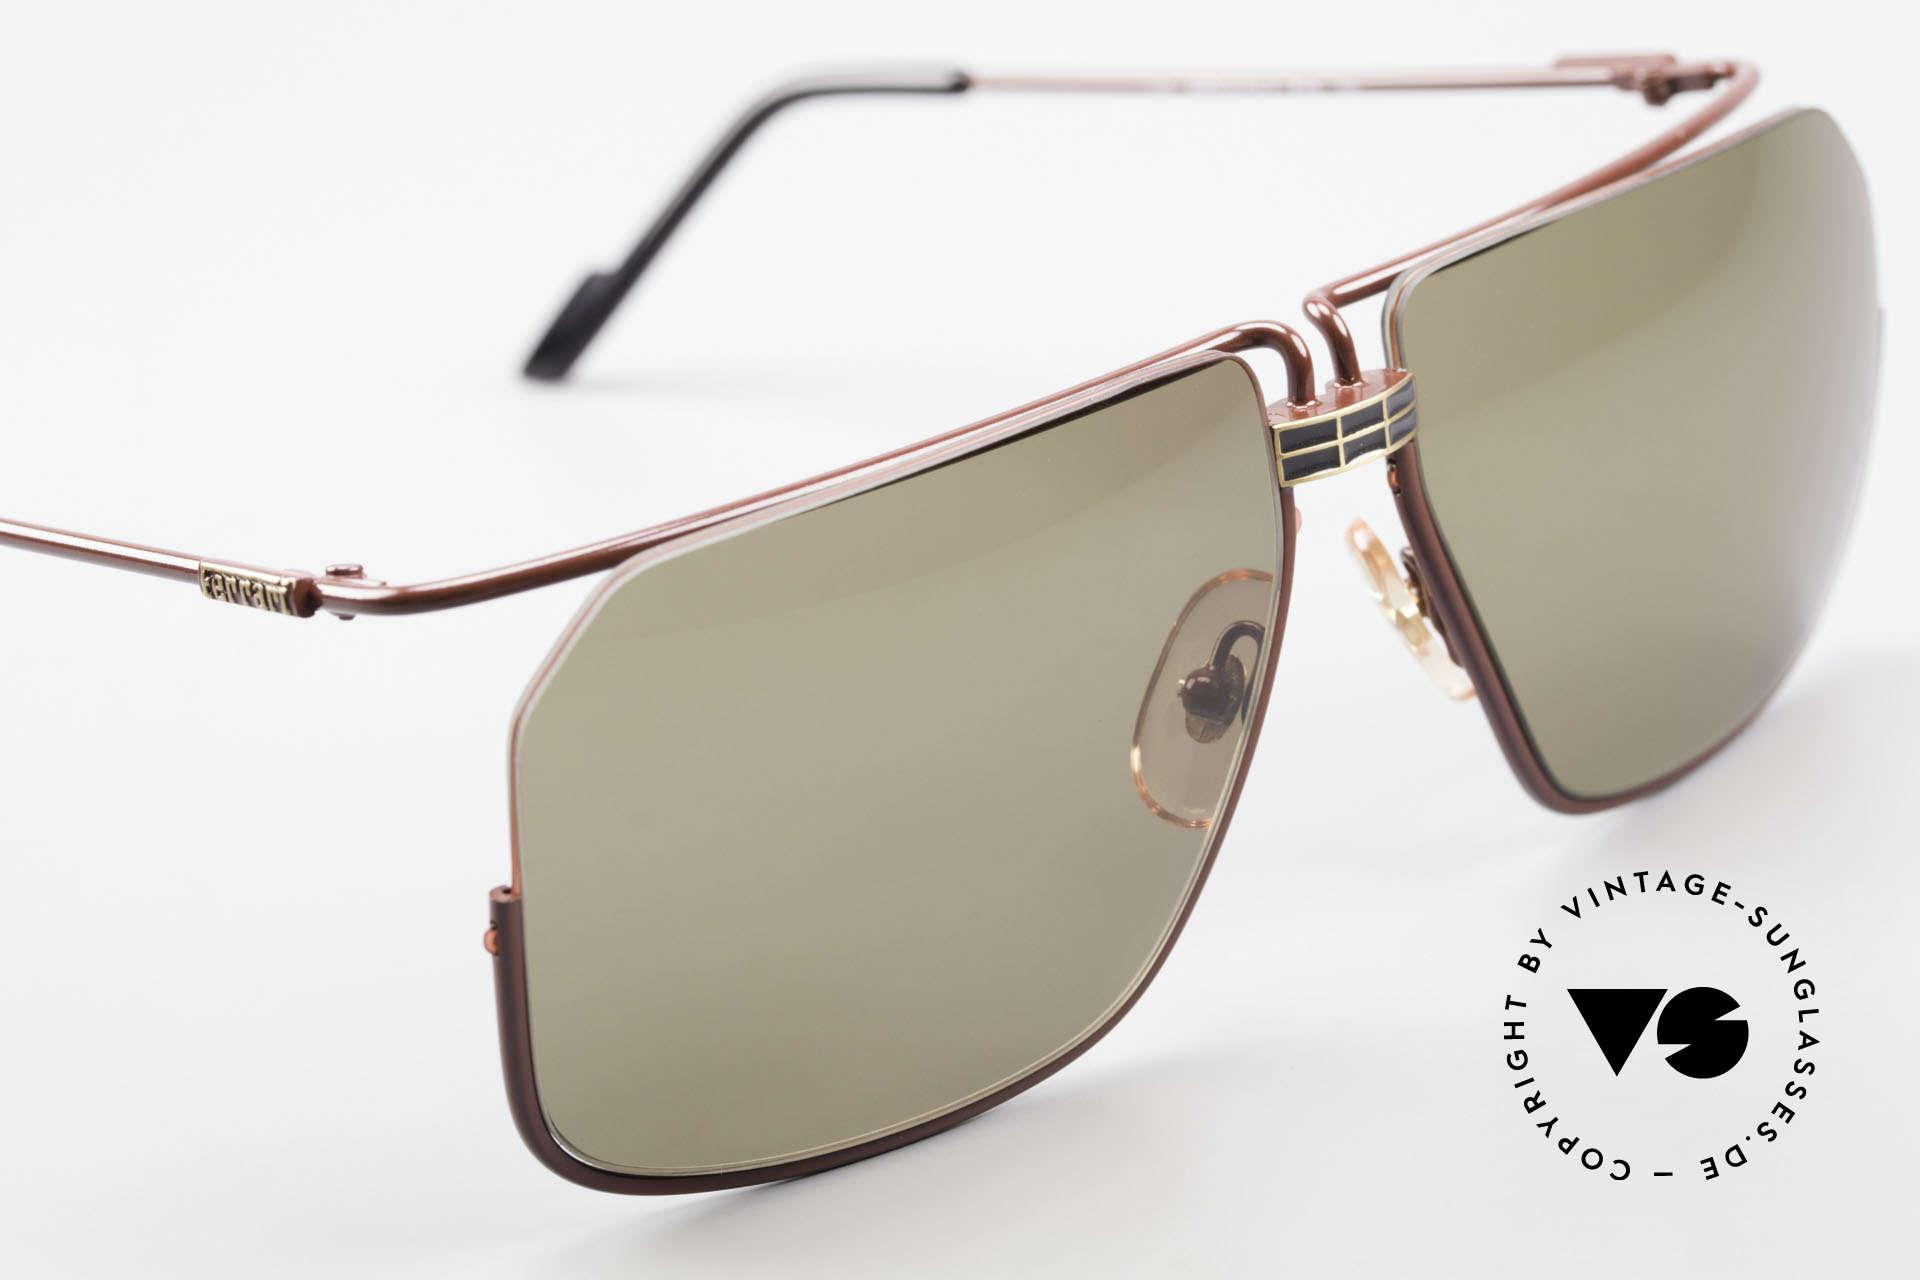 Ferrari F18/S Ferrari Formula 1 Sunglasses, NO RETRO sunglasses, an old ORIGINAL from the 1990's!, Made for Men